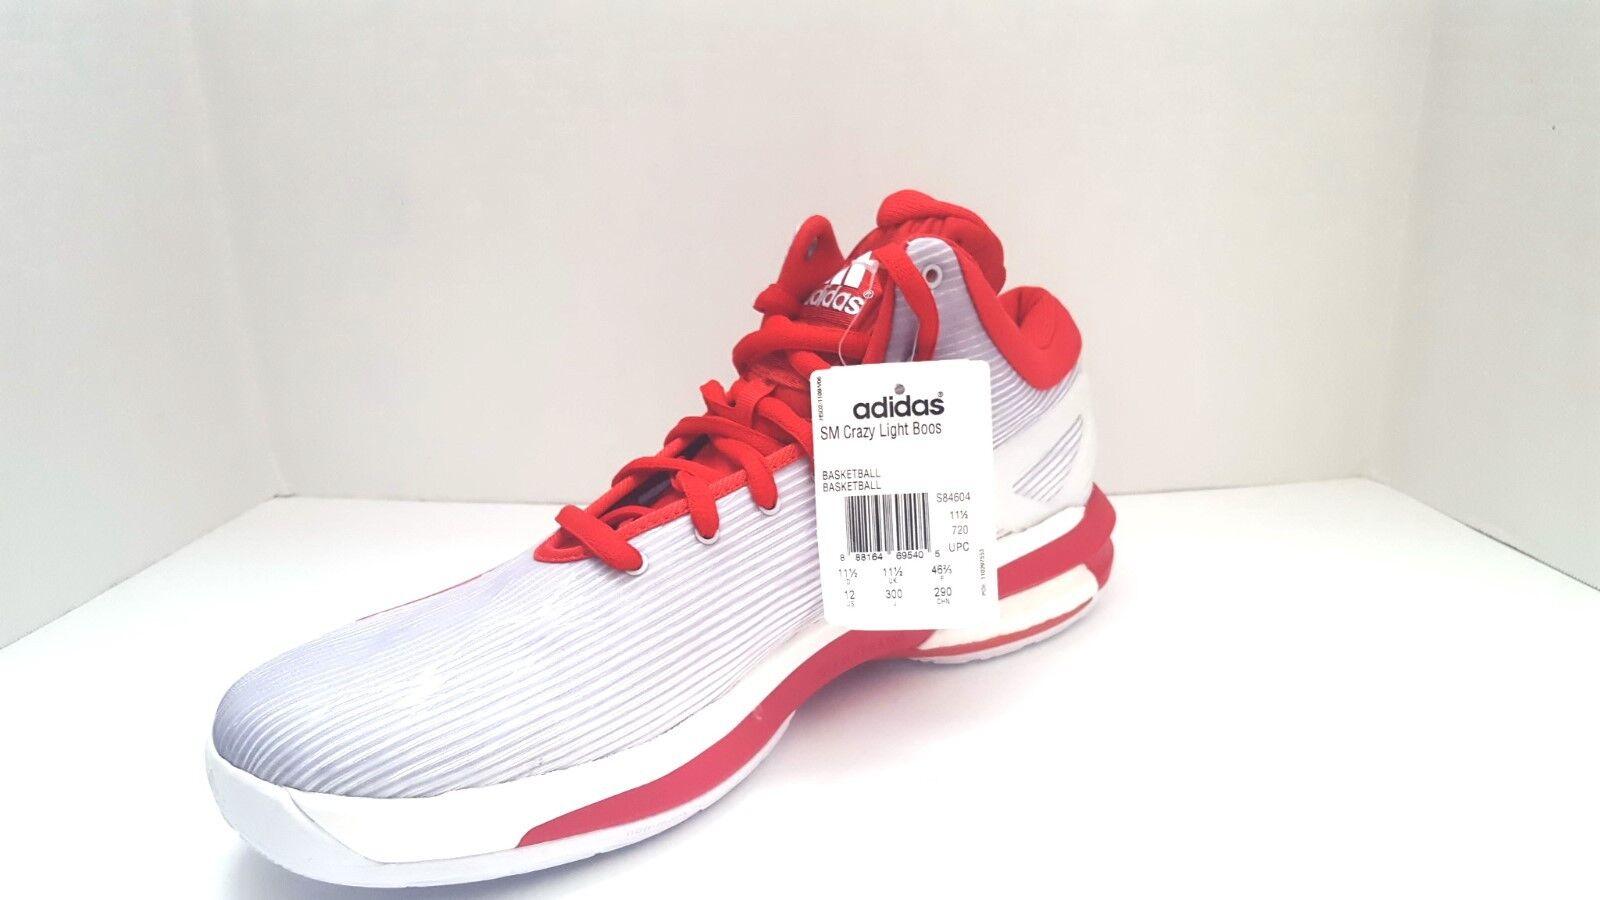 neue adidas - mann ist sm - verrückte licht boos basketball - sm schuhe sz 12us 06da10